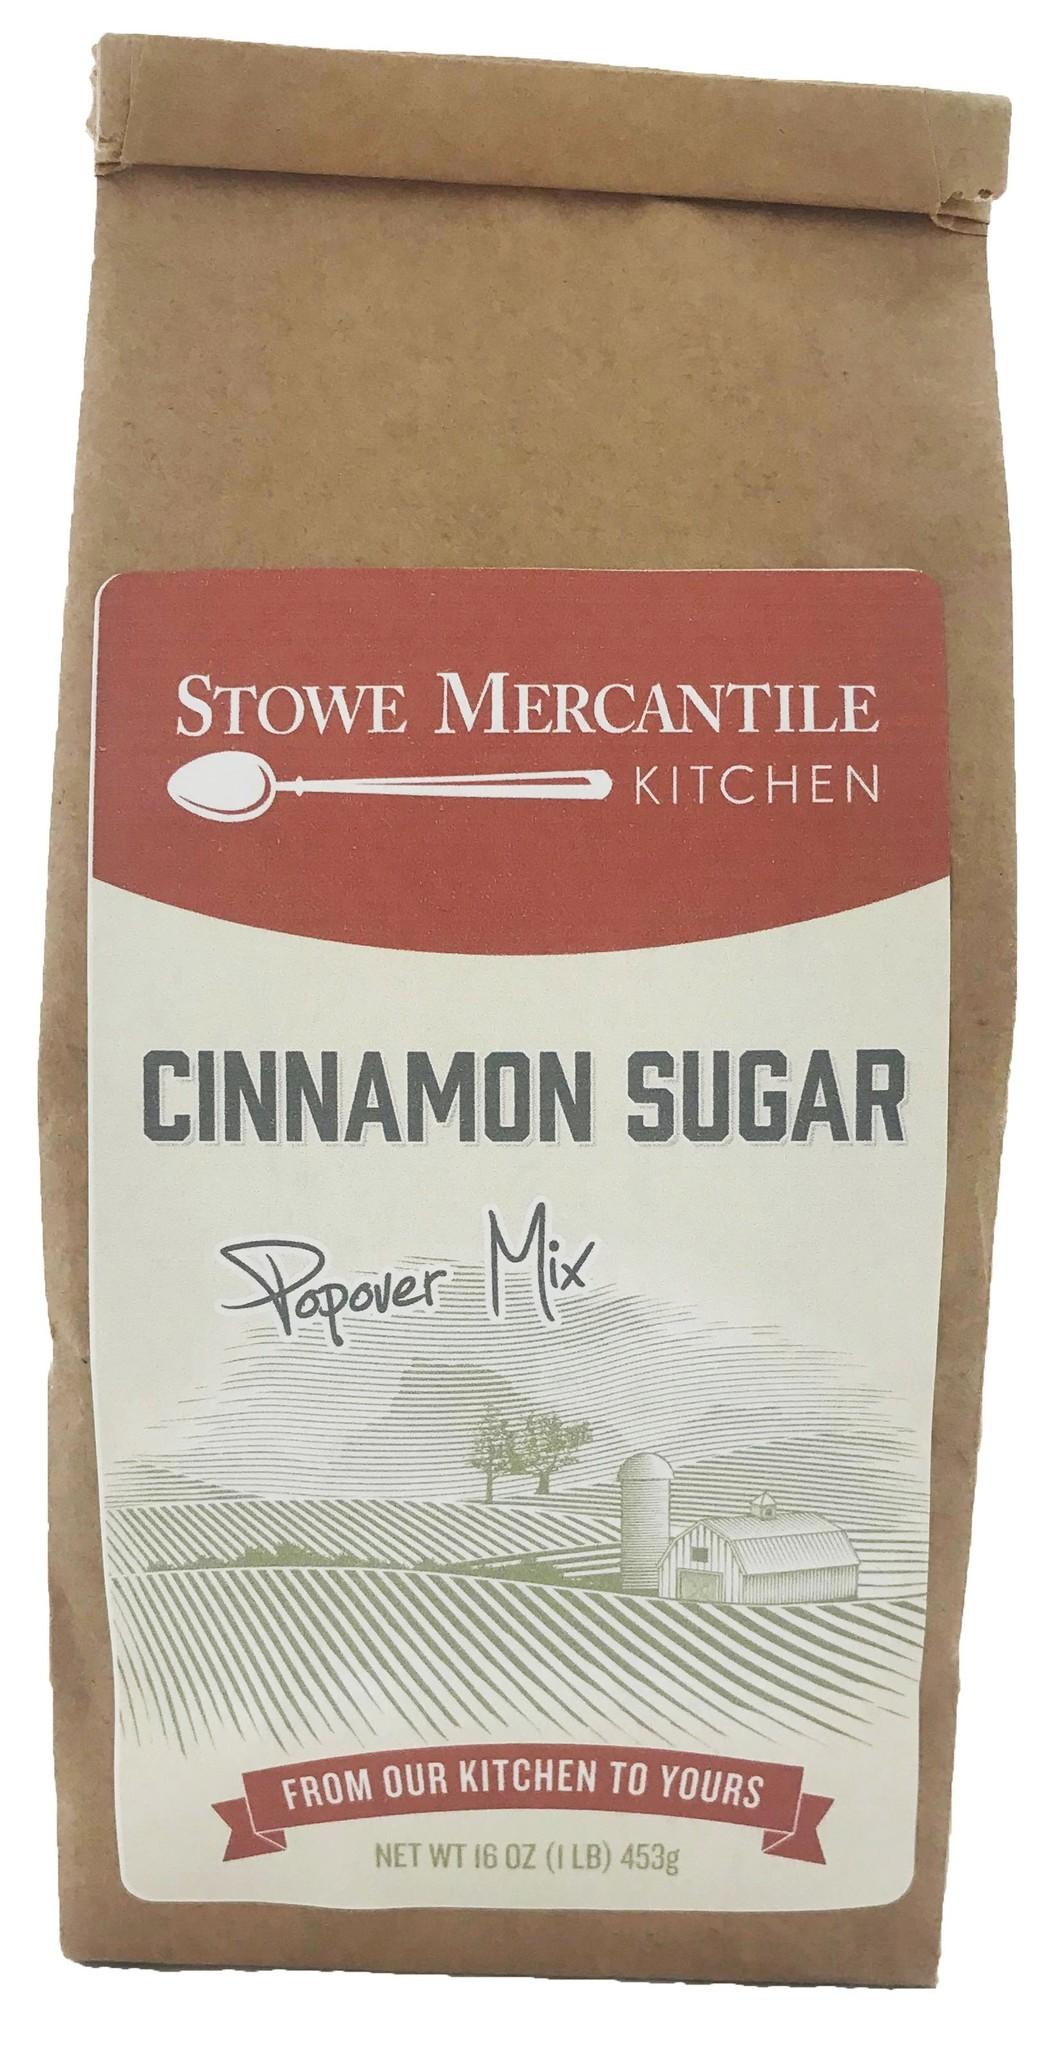 Stowe Mercantile Kitchen Popover Mix Cinnamon Sugar